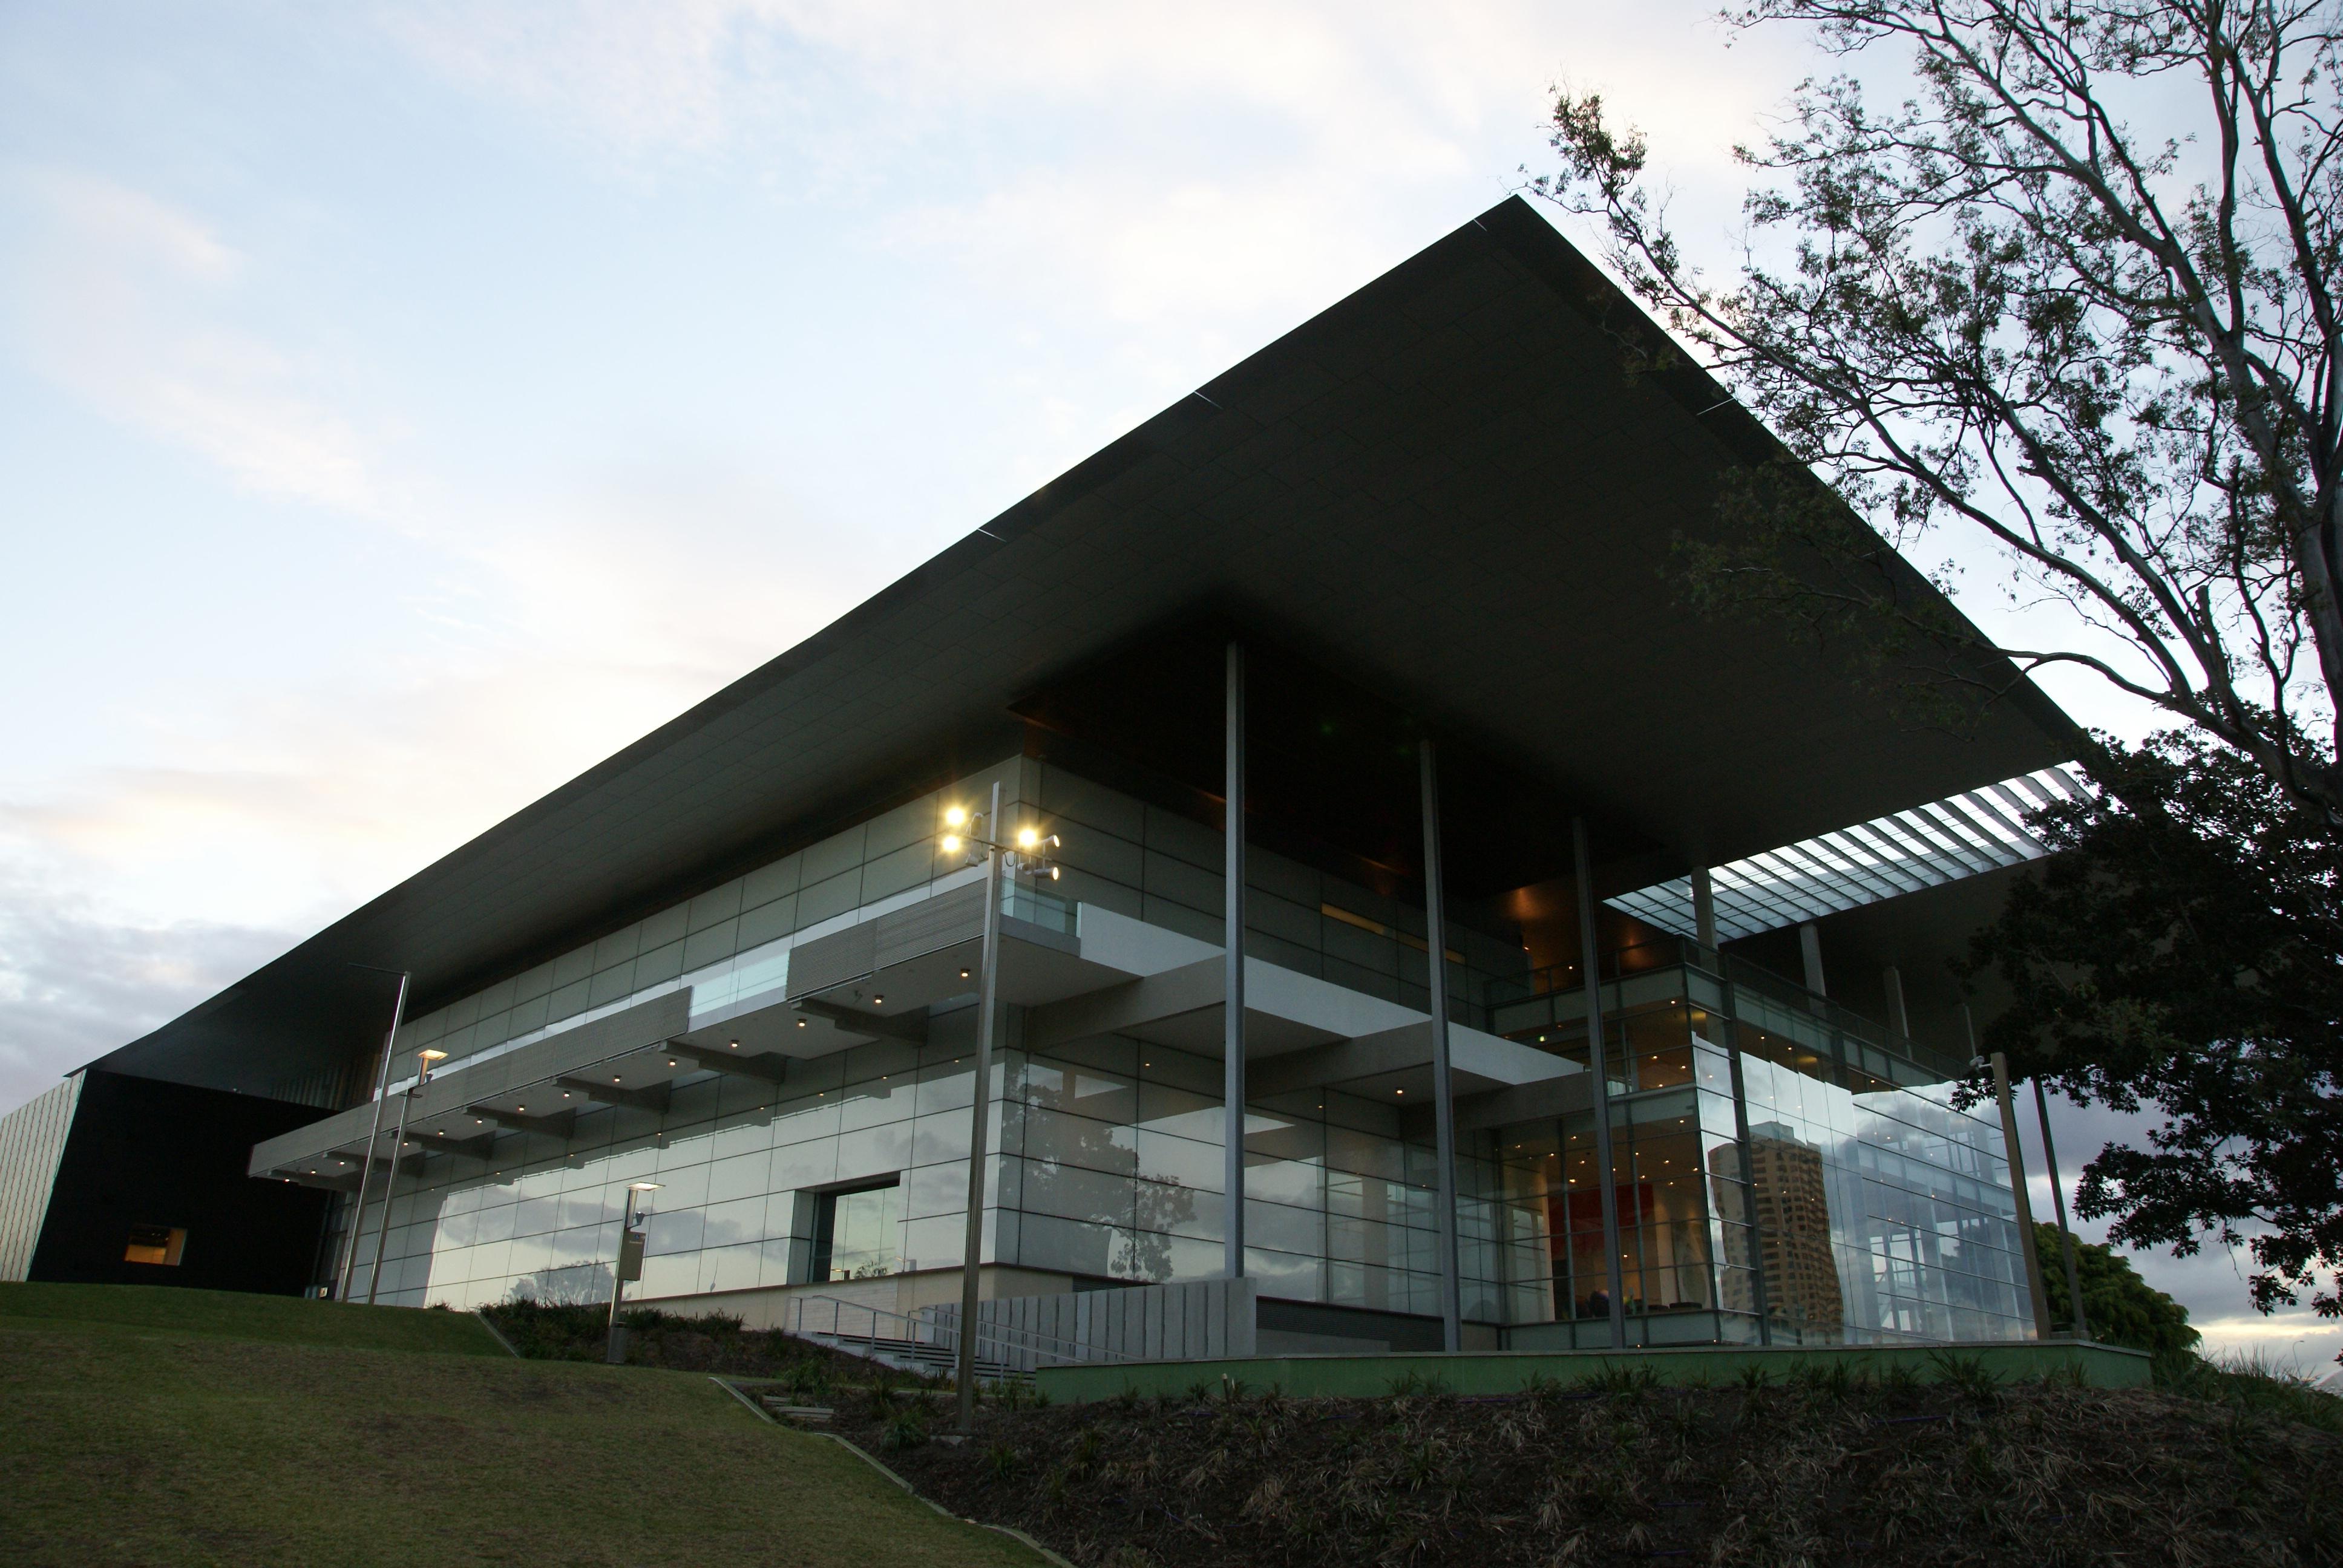 queensland gallery of modern art  u2013 exterior  u2013 raylinc lighting